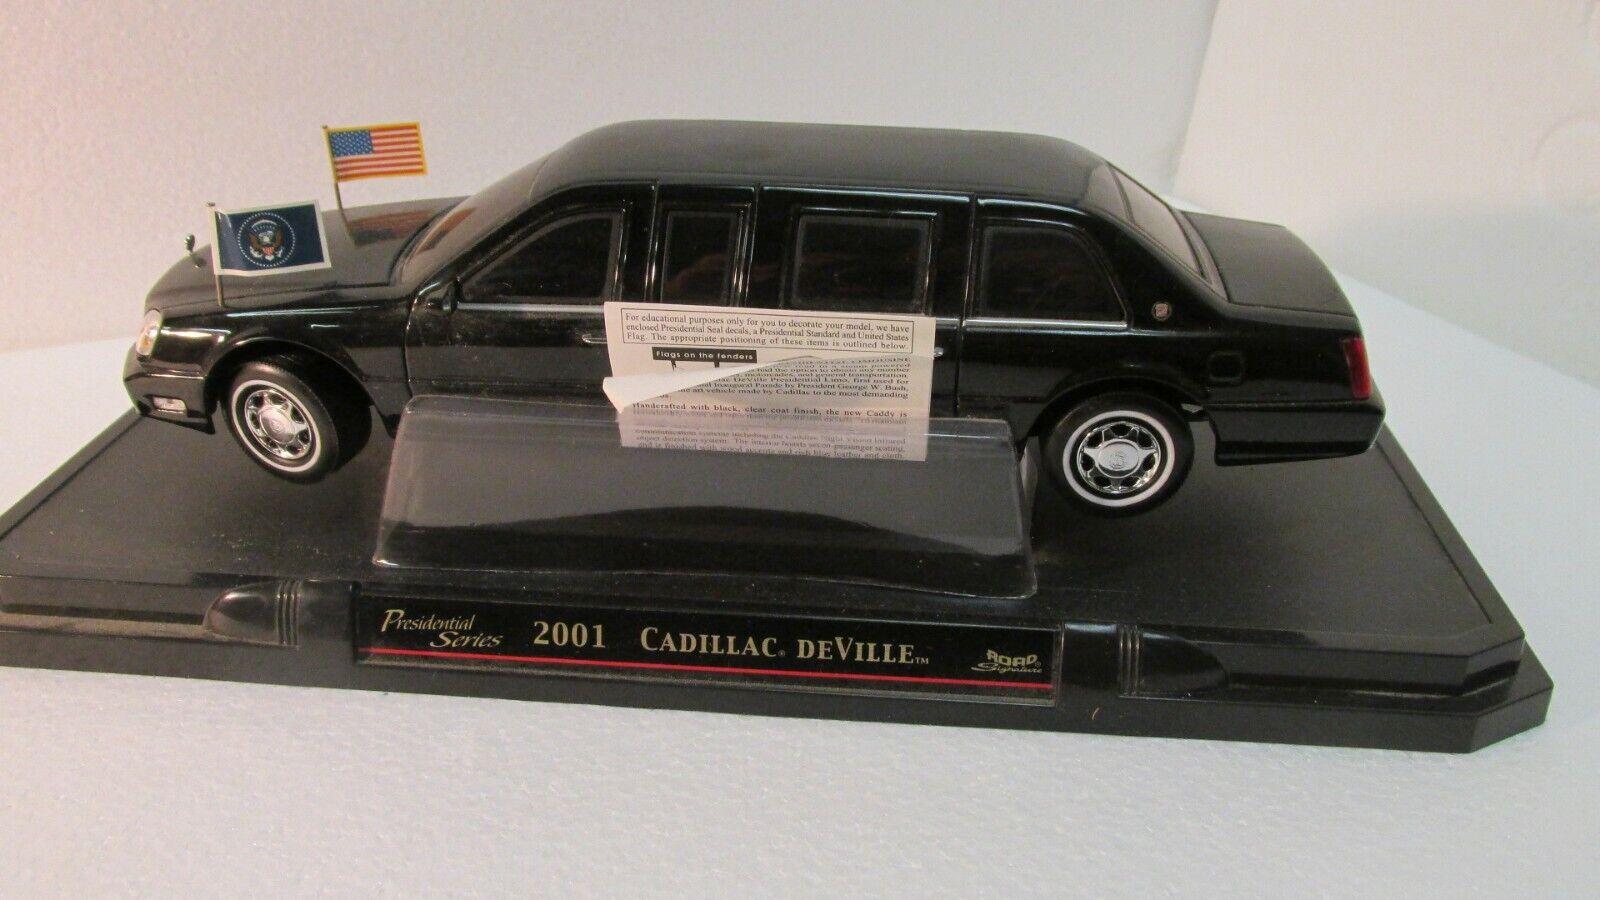 Road Signature Presidential Series 2001 Cadillac DeVille 1 24 Scale Diecast